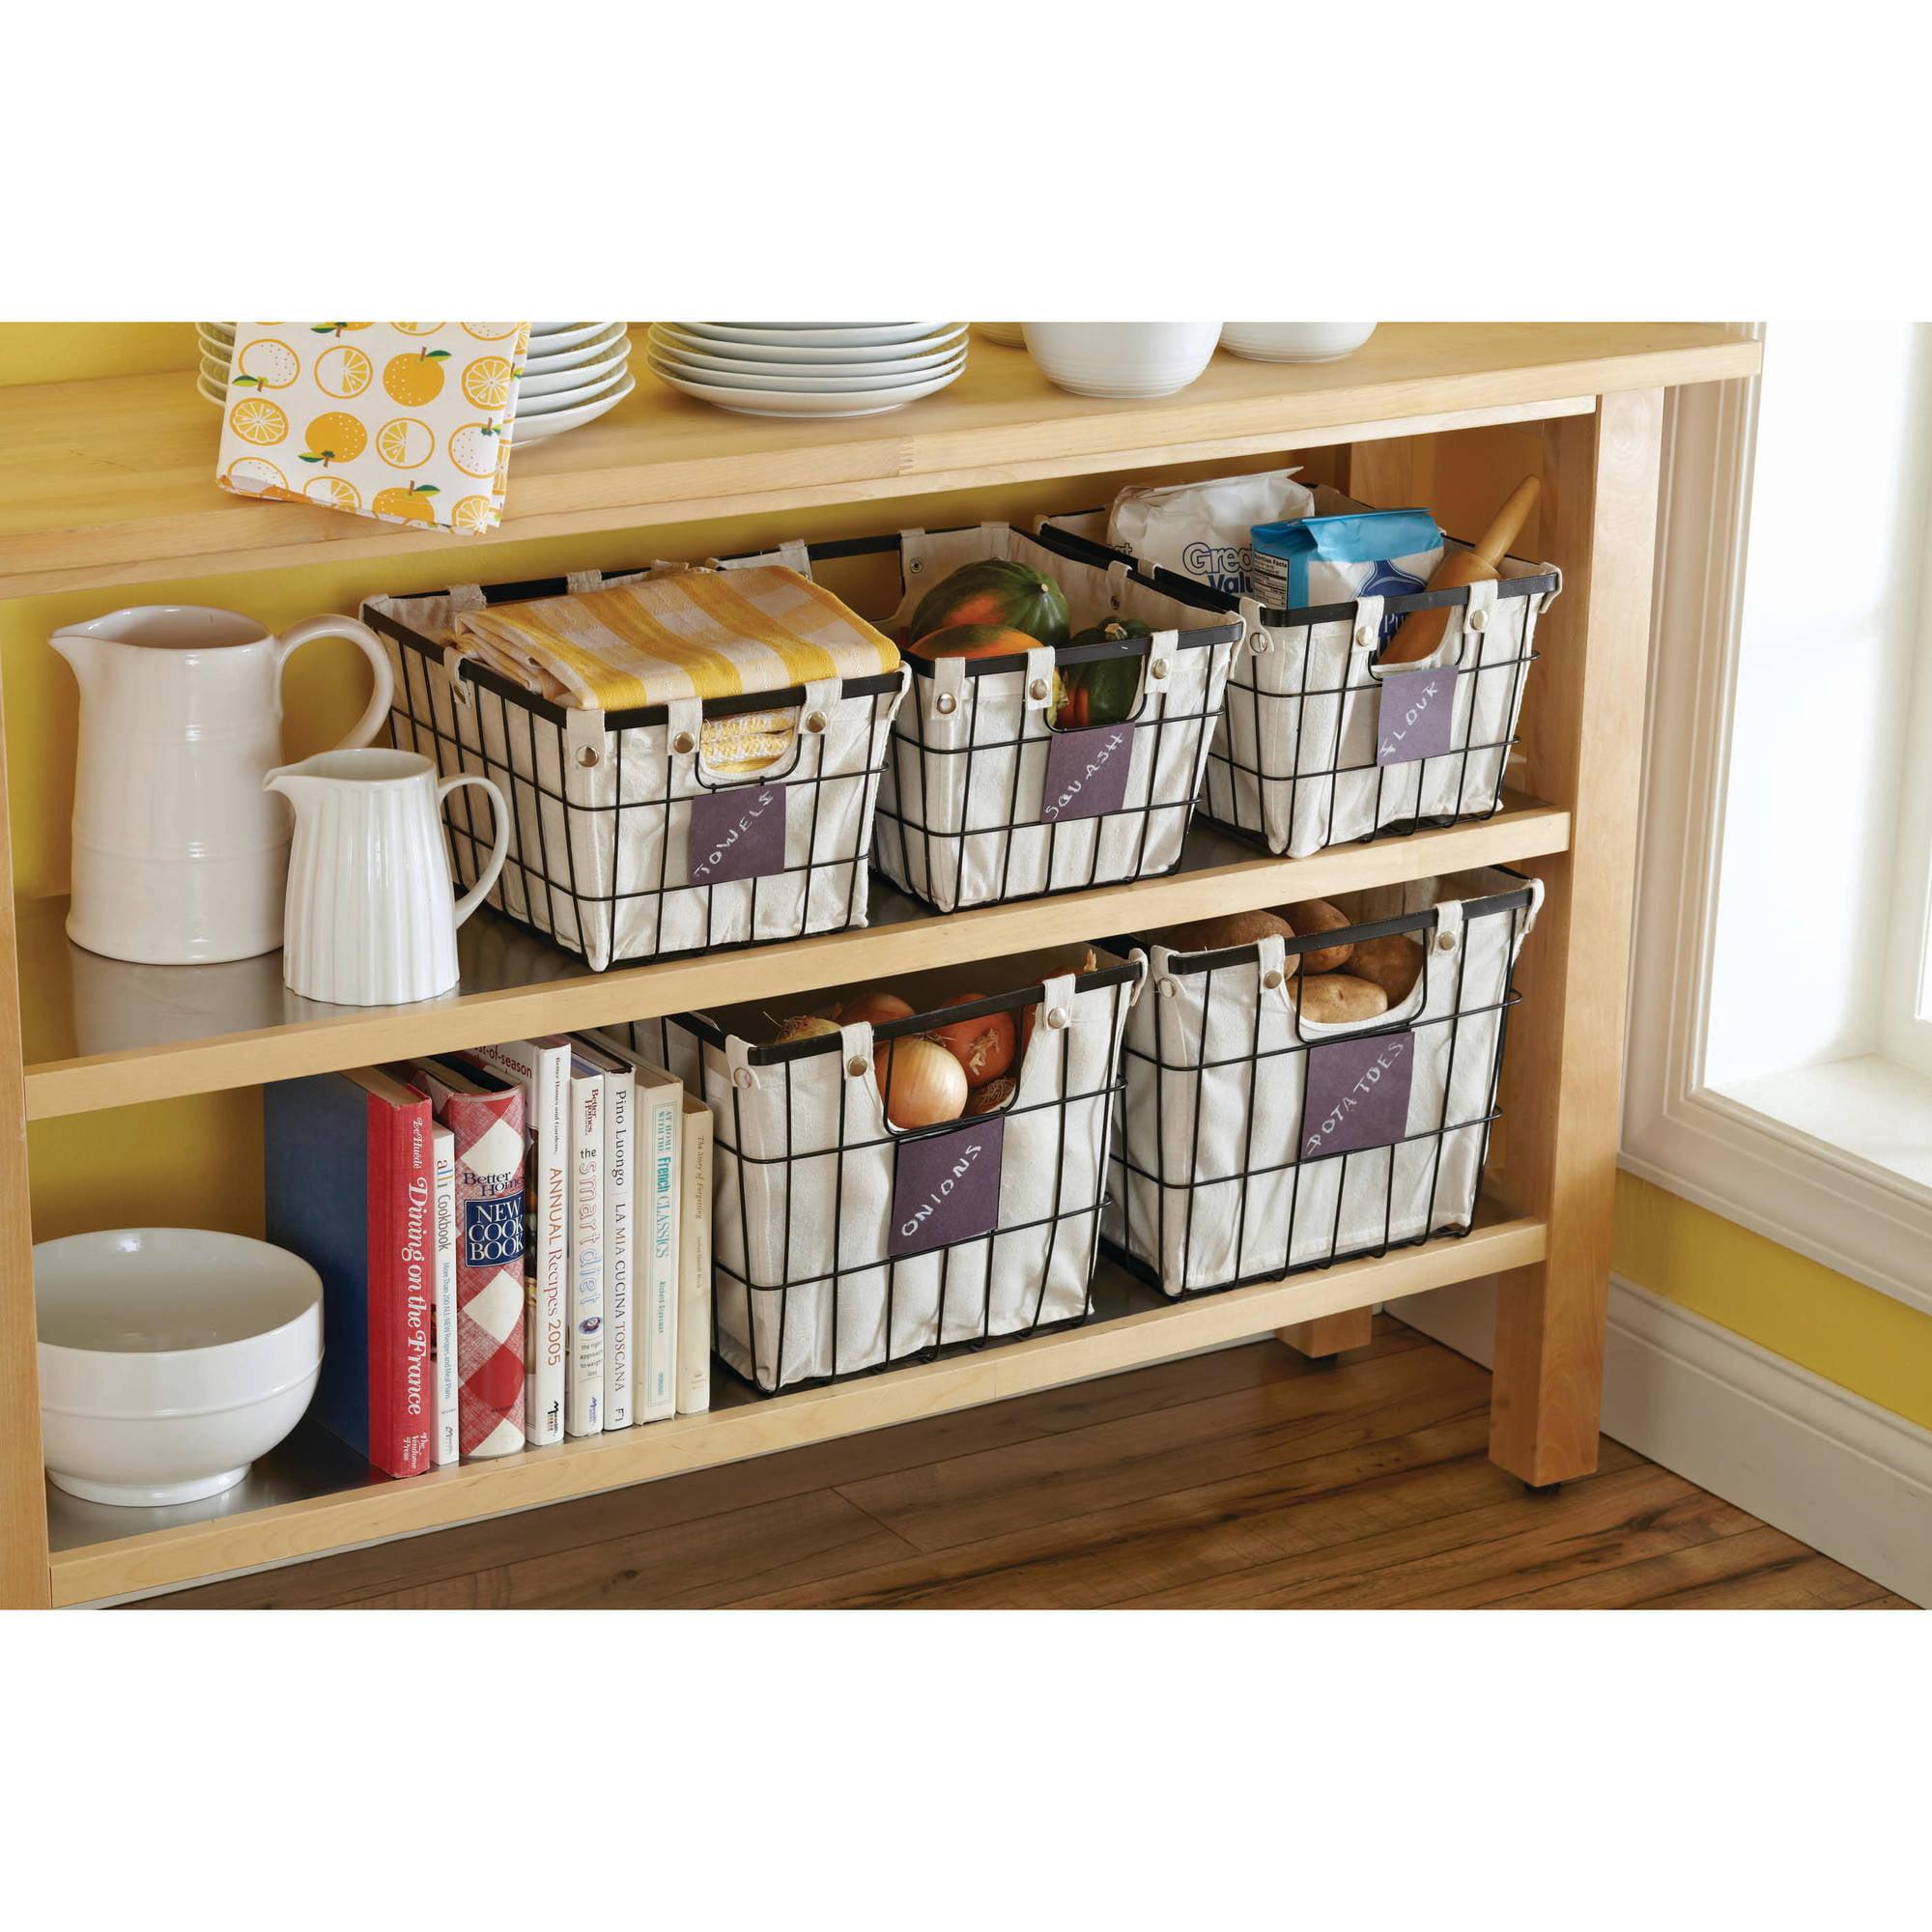 Wire Basket Storage Bin Better Homes And Gardens W Chalkboard Label Small  Black